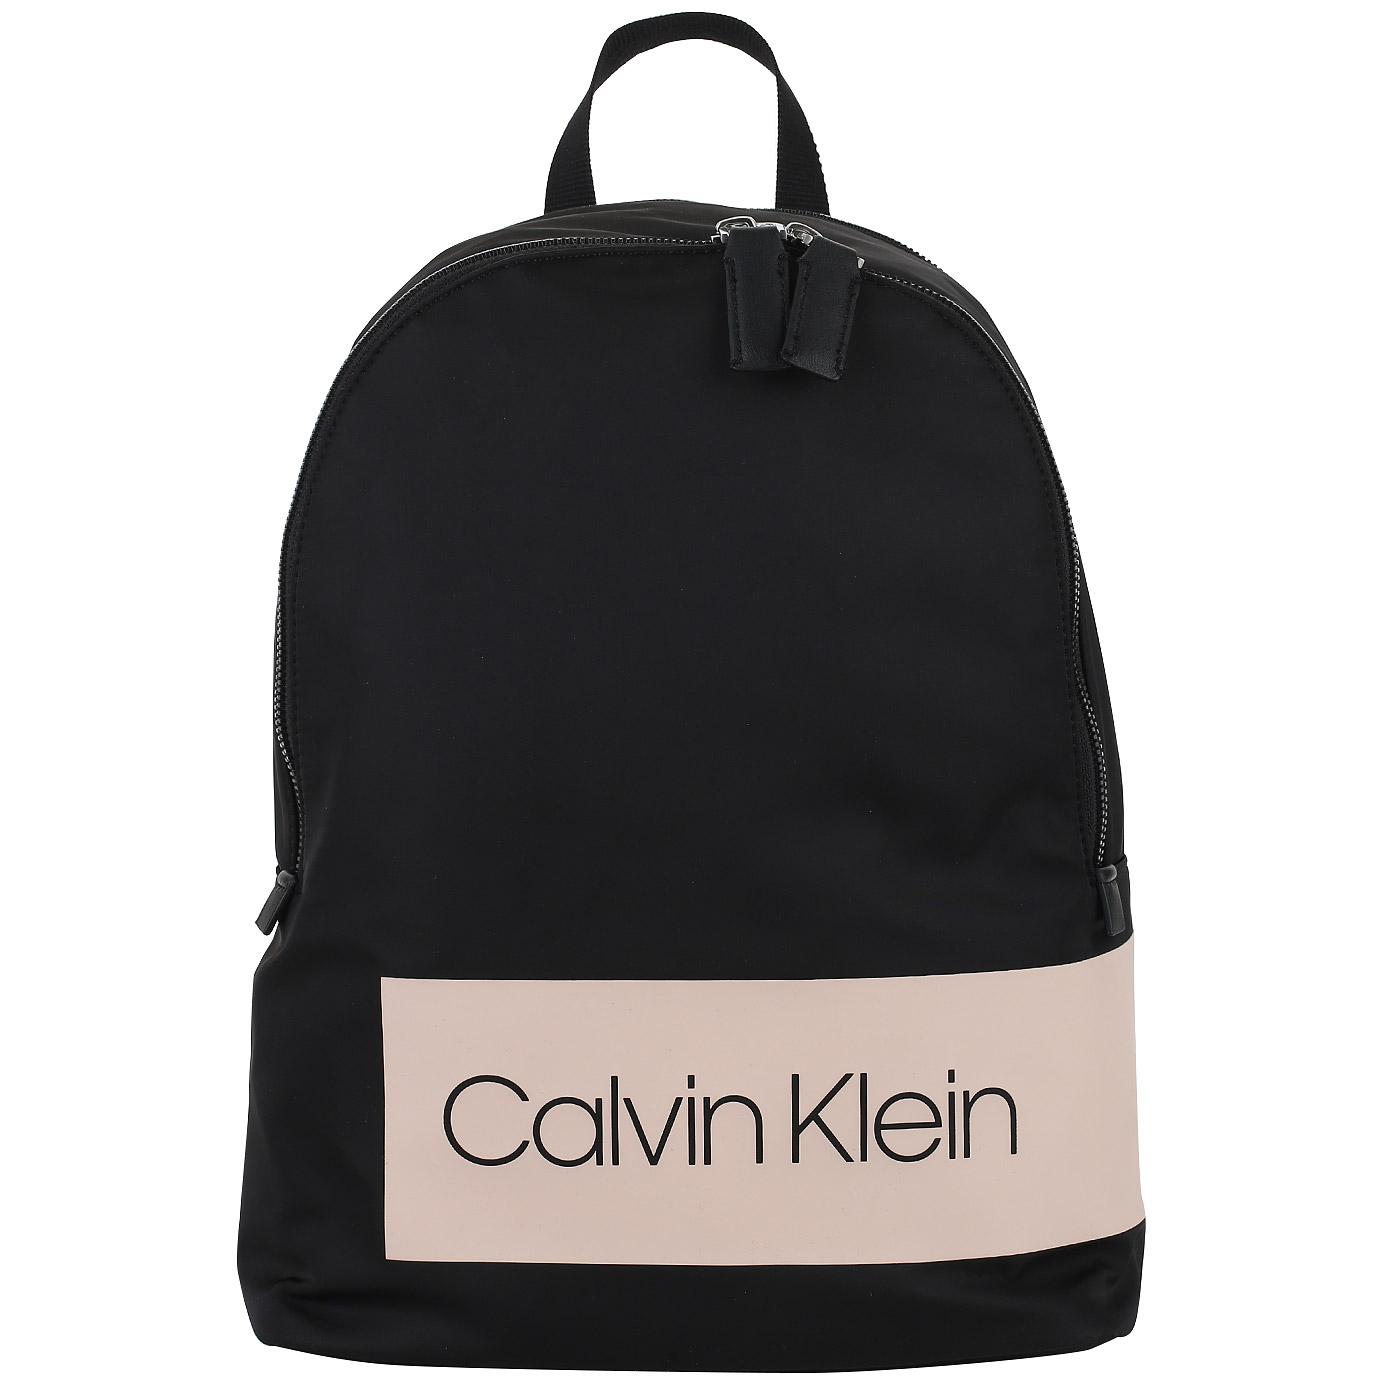 Рюкзак на молнии Calvin Klein Jeans Pre Fall K60K604282 001 ... 2d71c88c143